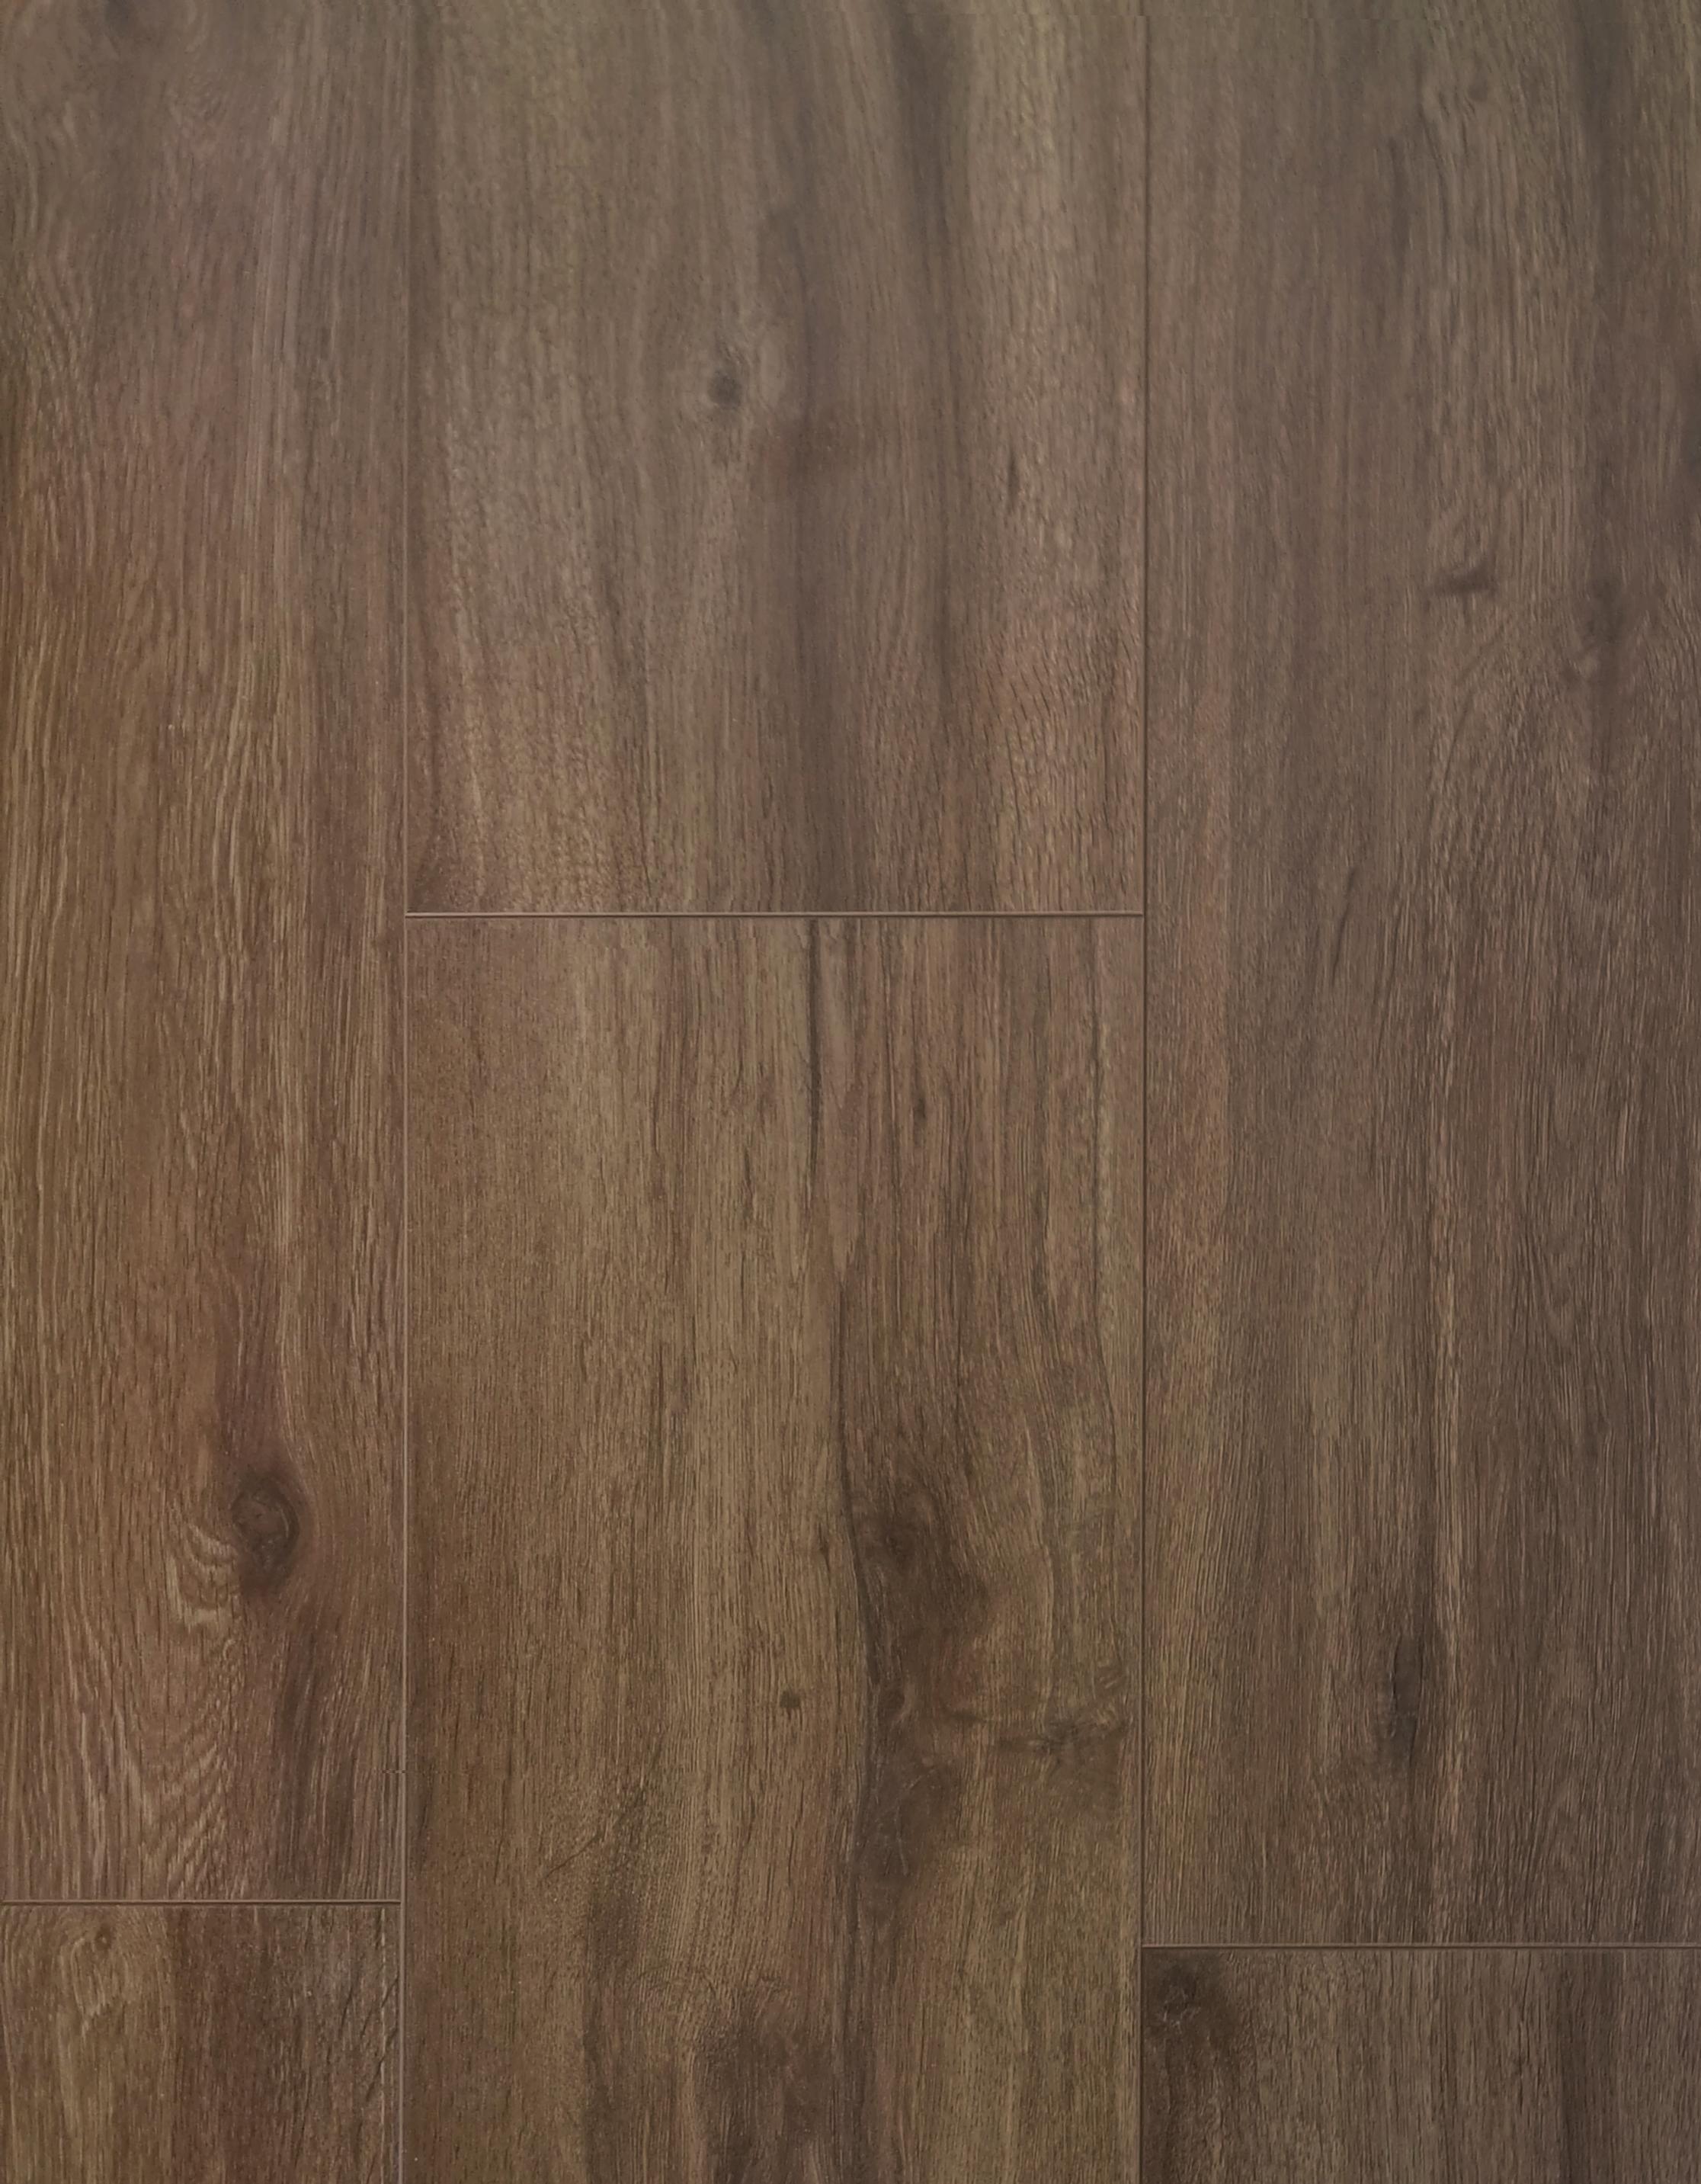 Elegant Oak Grey Laminate Flooring Tg8112